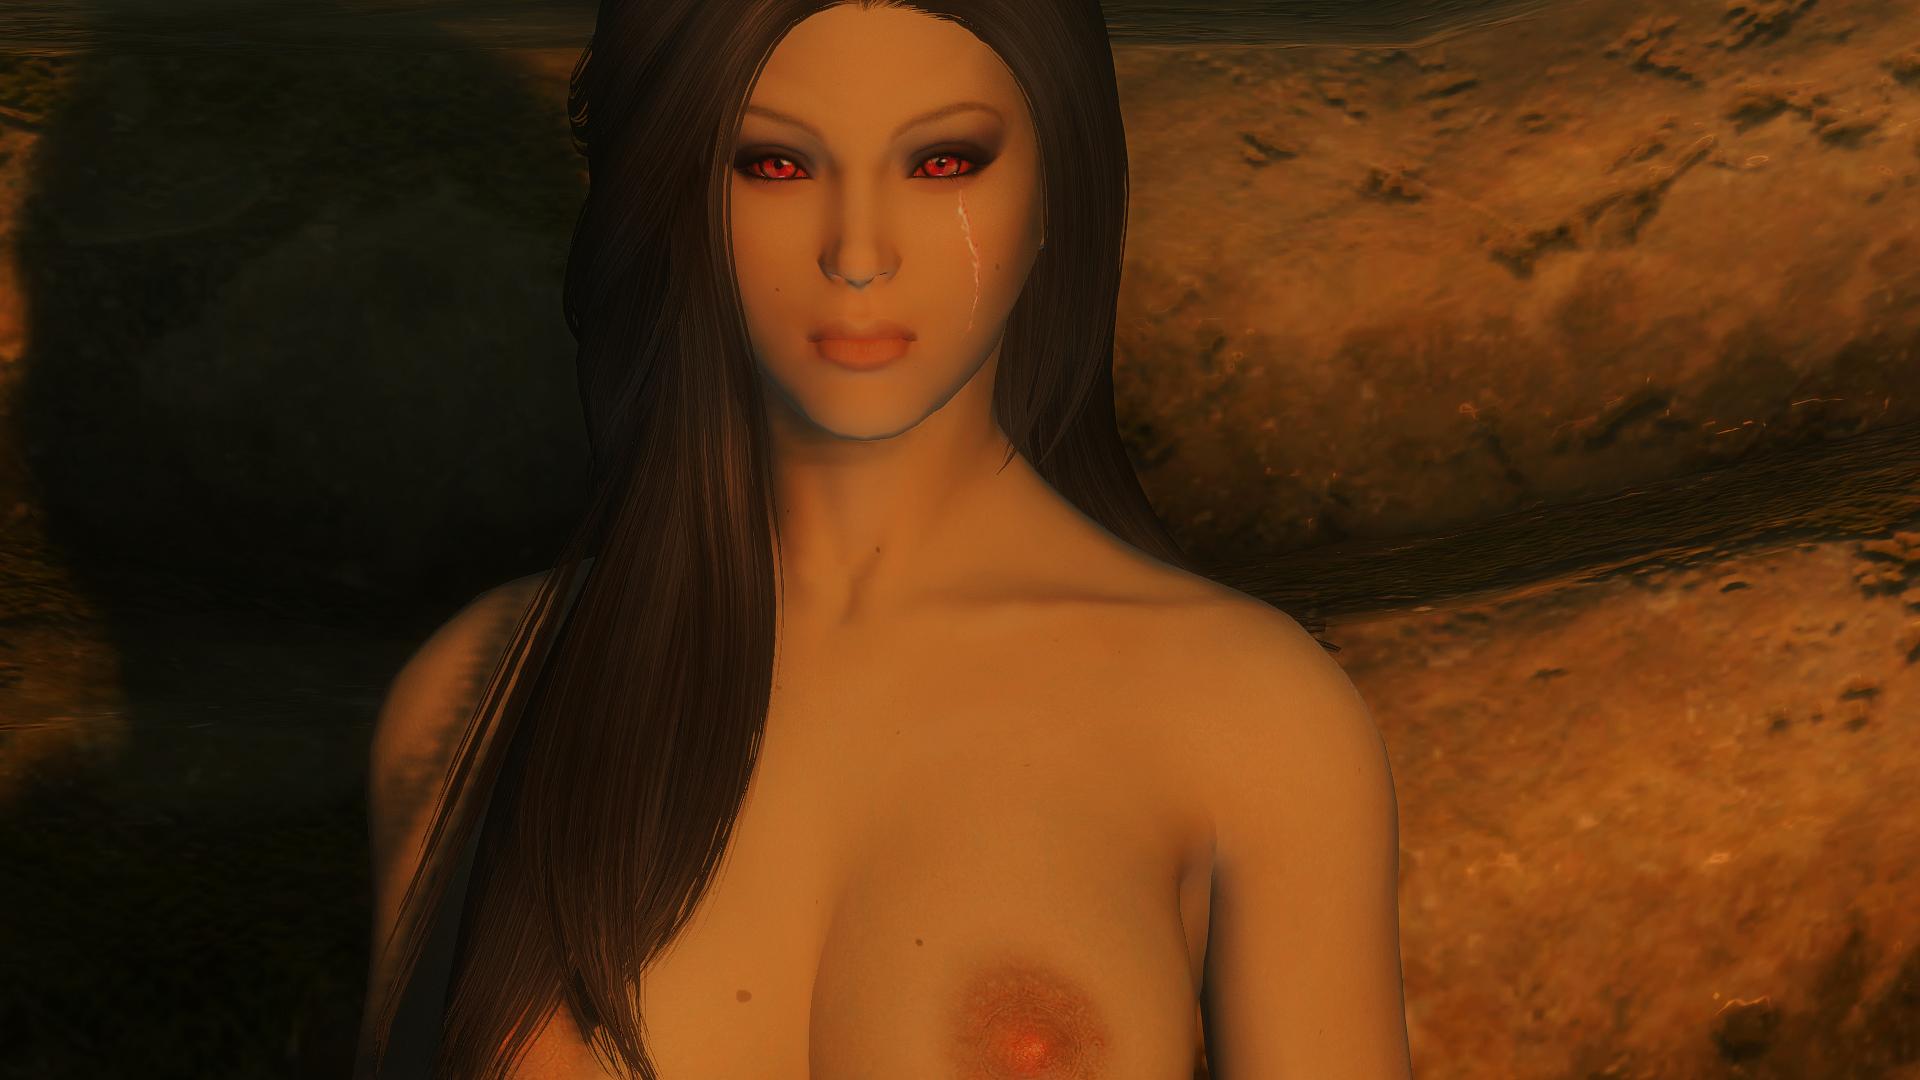 skyrim_sse_yg_dark_elf_dusk_7_by_silvist